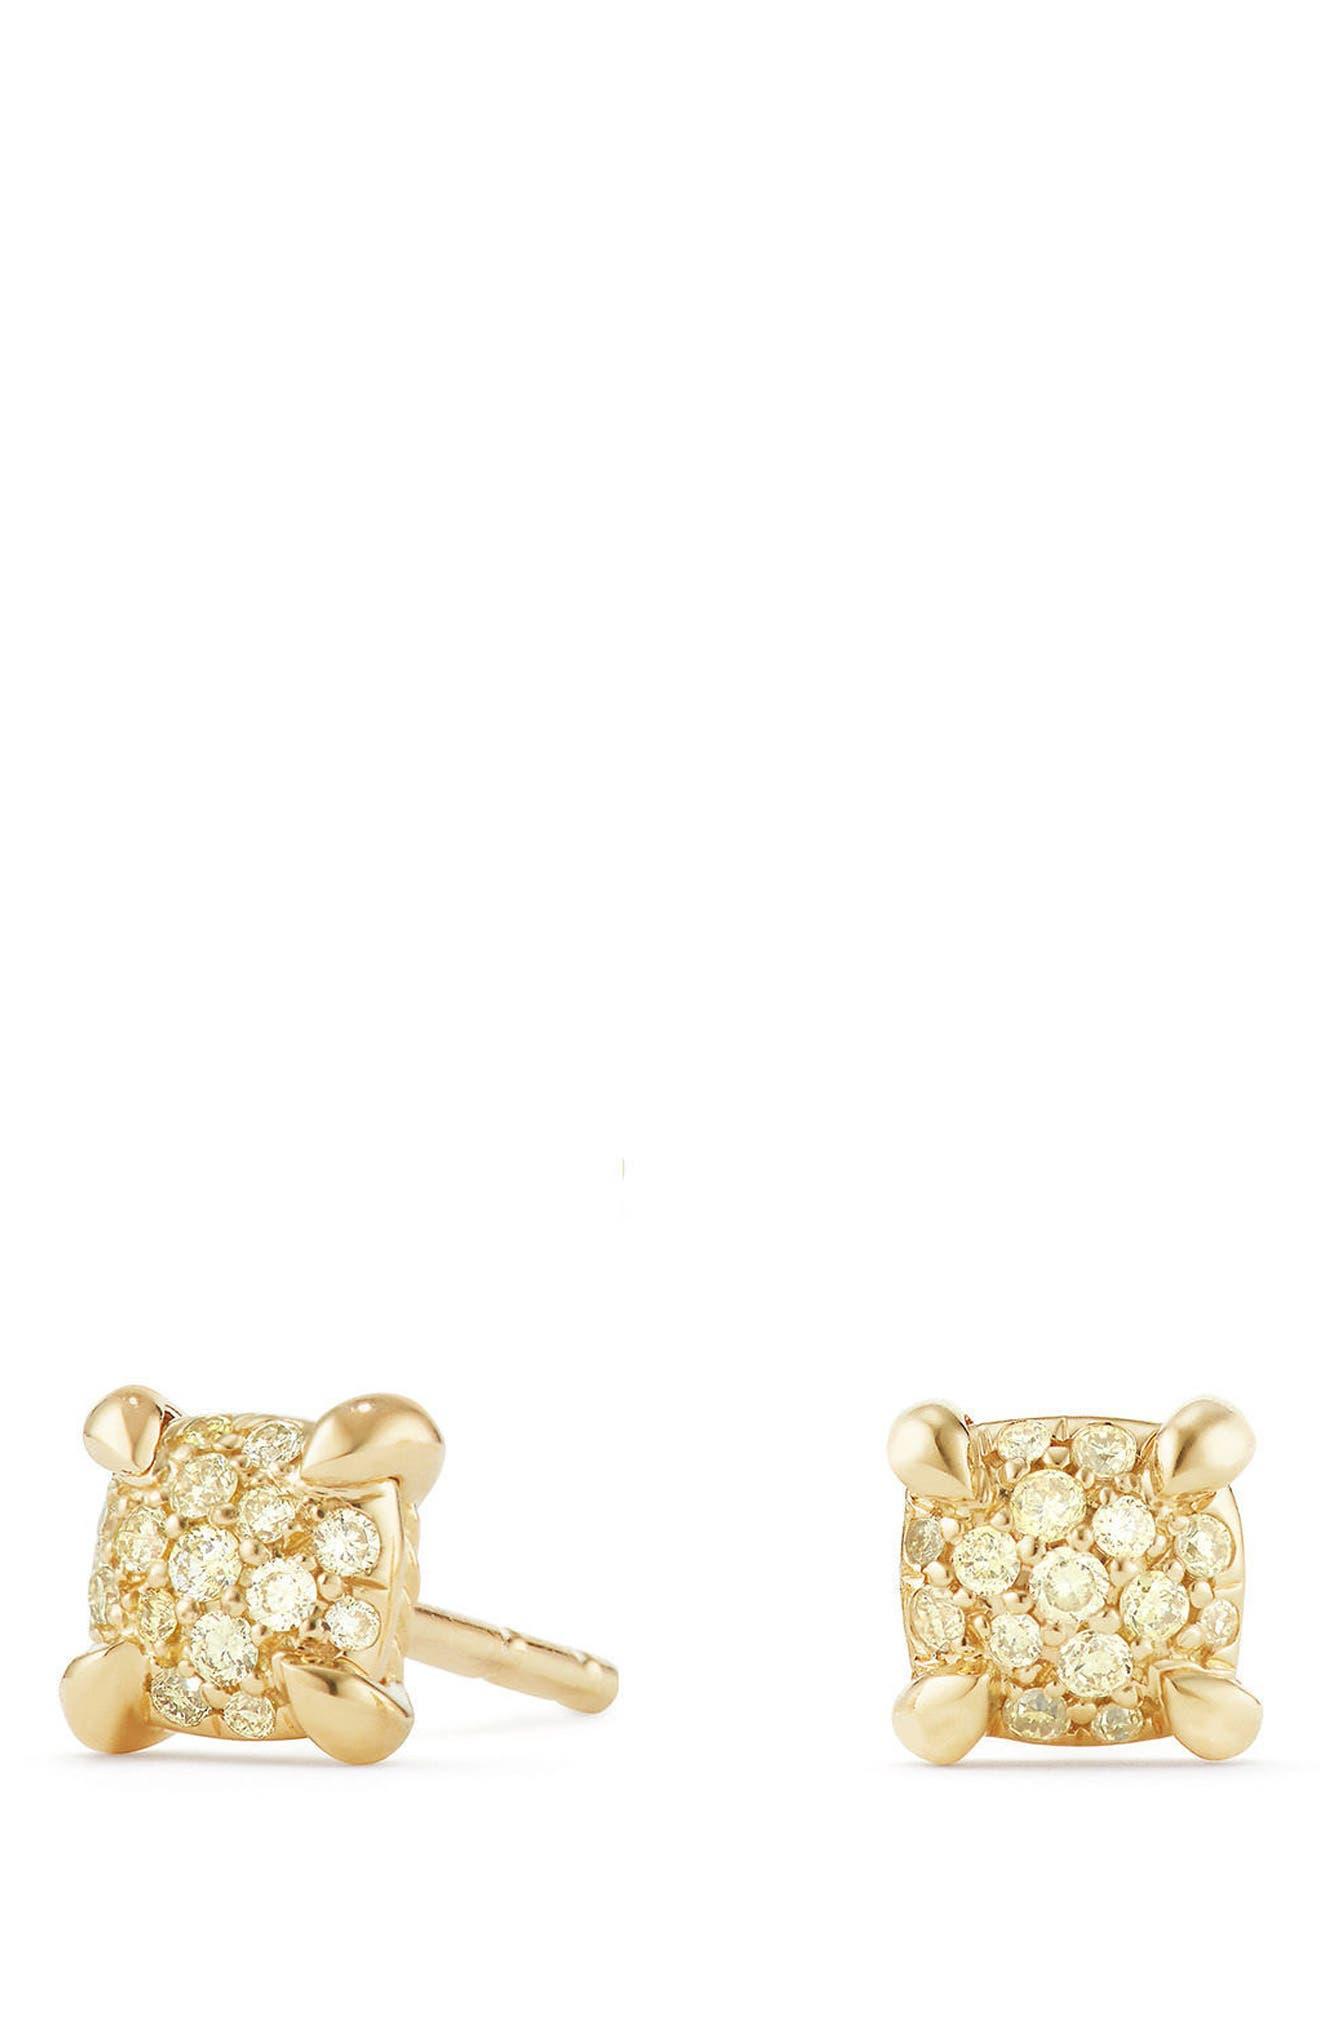 Châtelaine Stud Earrings with Diamonds,                         Main,                         color, Yellow Diamond